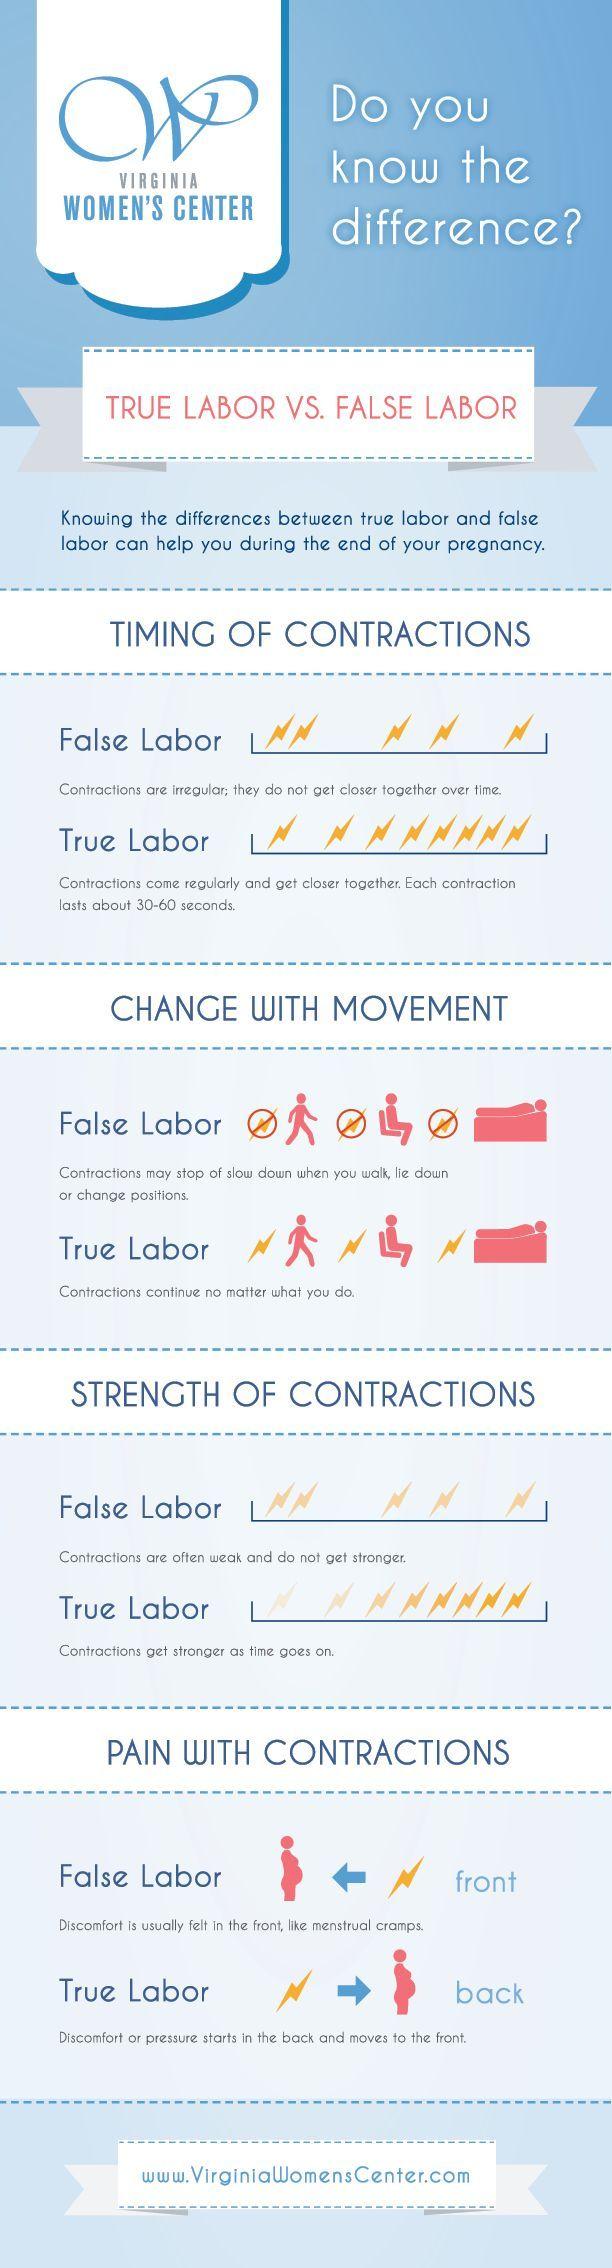 True Labor versus False Labor   Virginia Women's Center blog